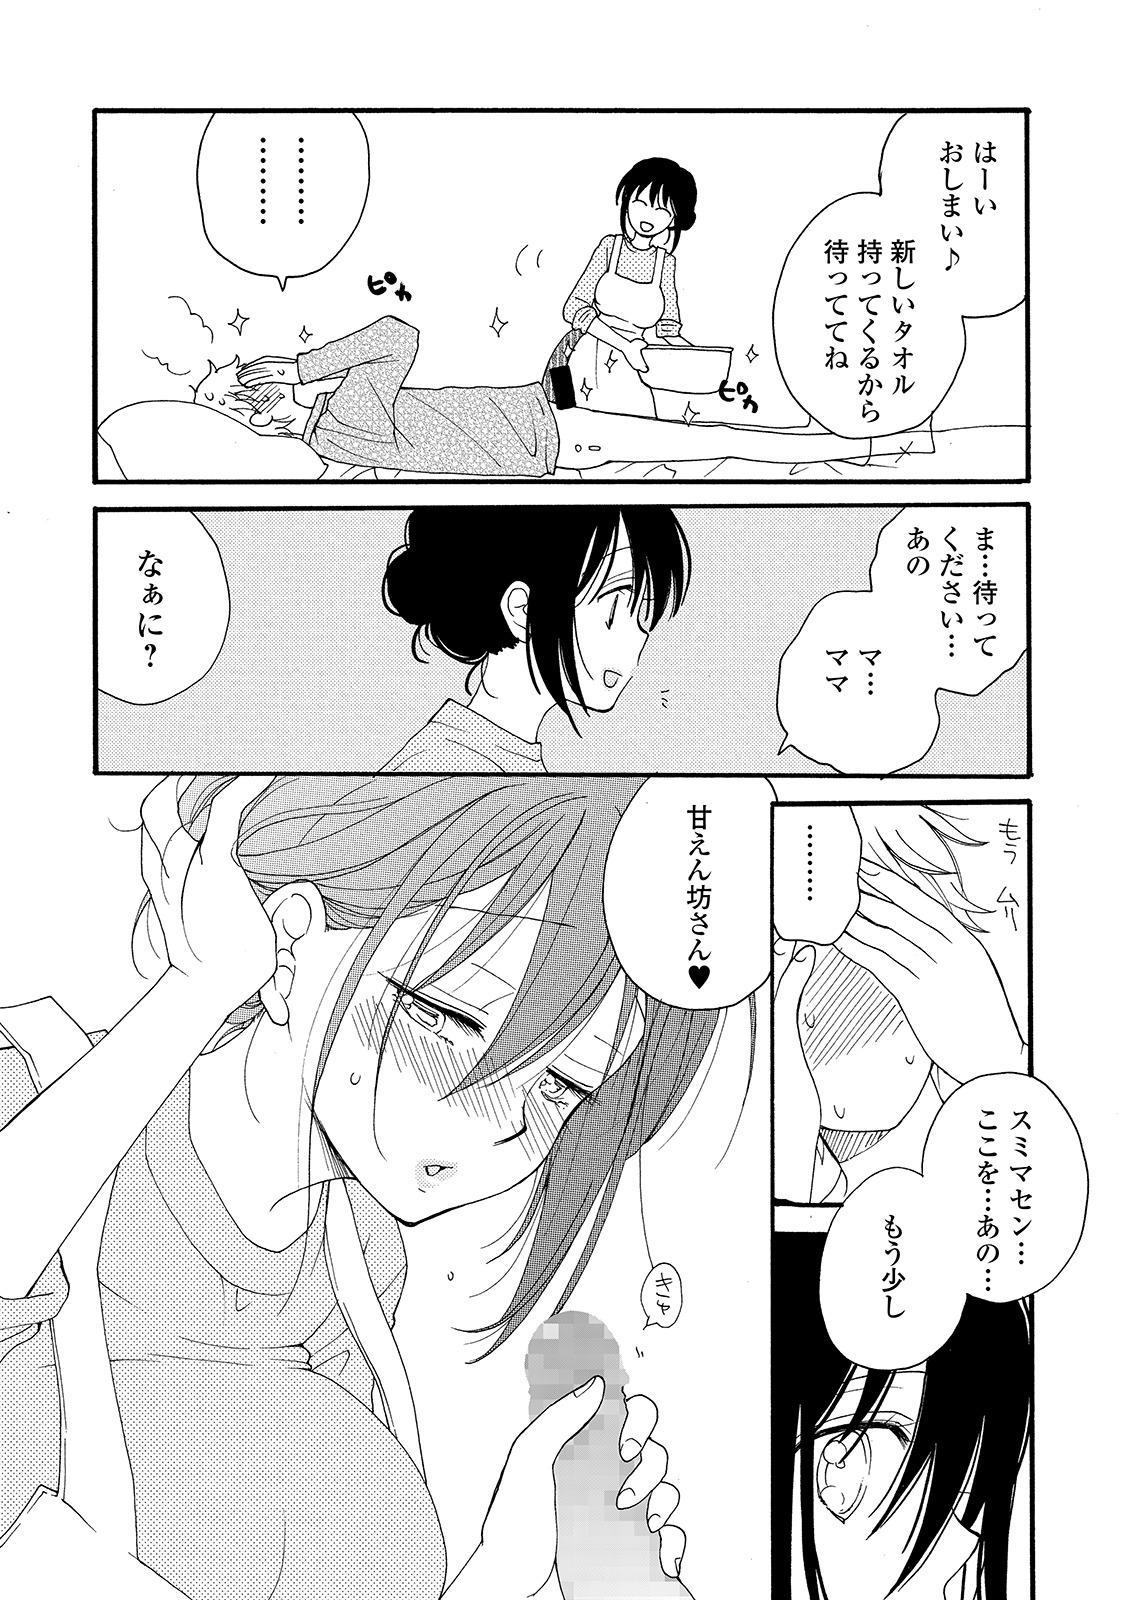 COMIC Shigekiteki SQUIRT!! Vol. 15 76